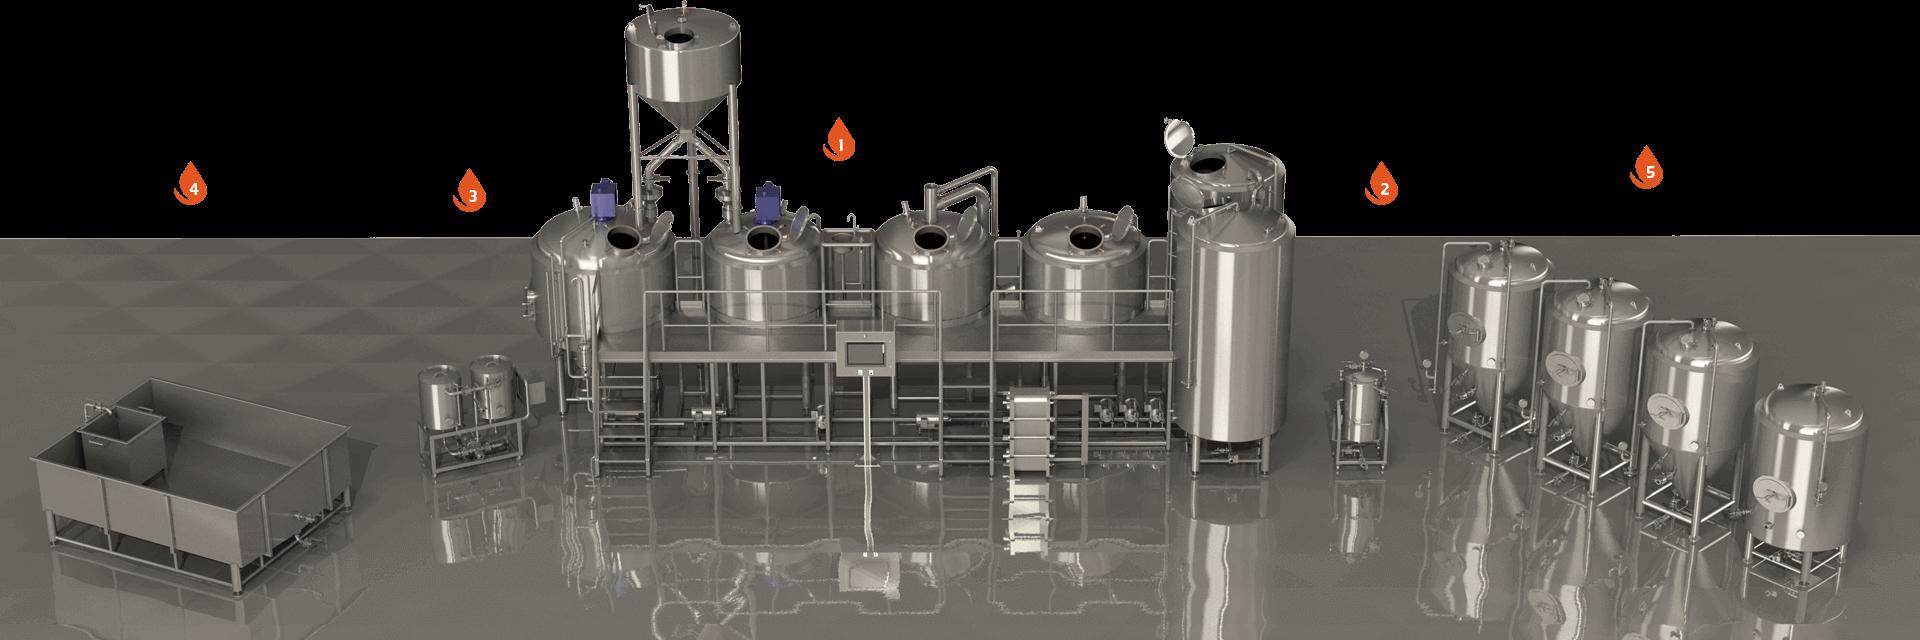 Custom Brewhouse Equipment Descriptions